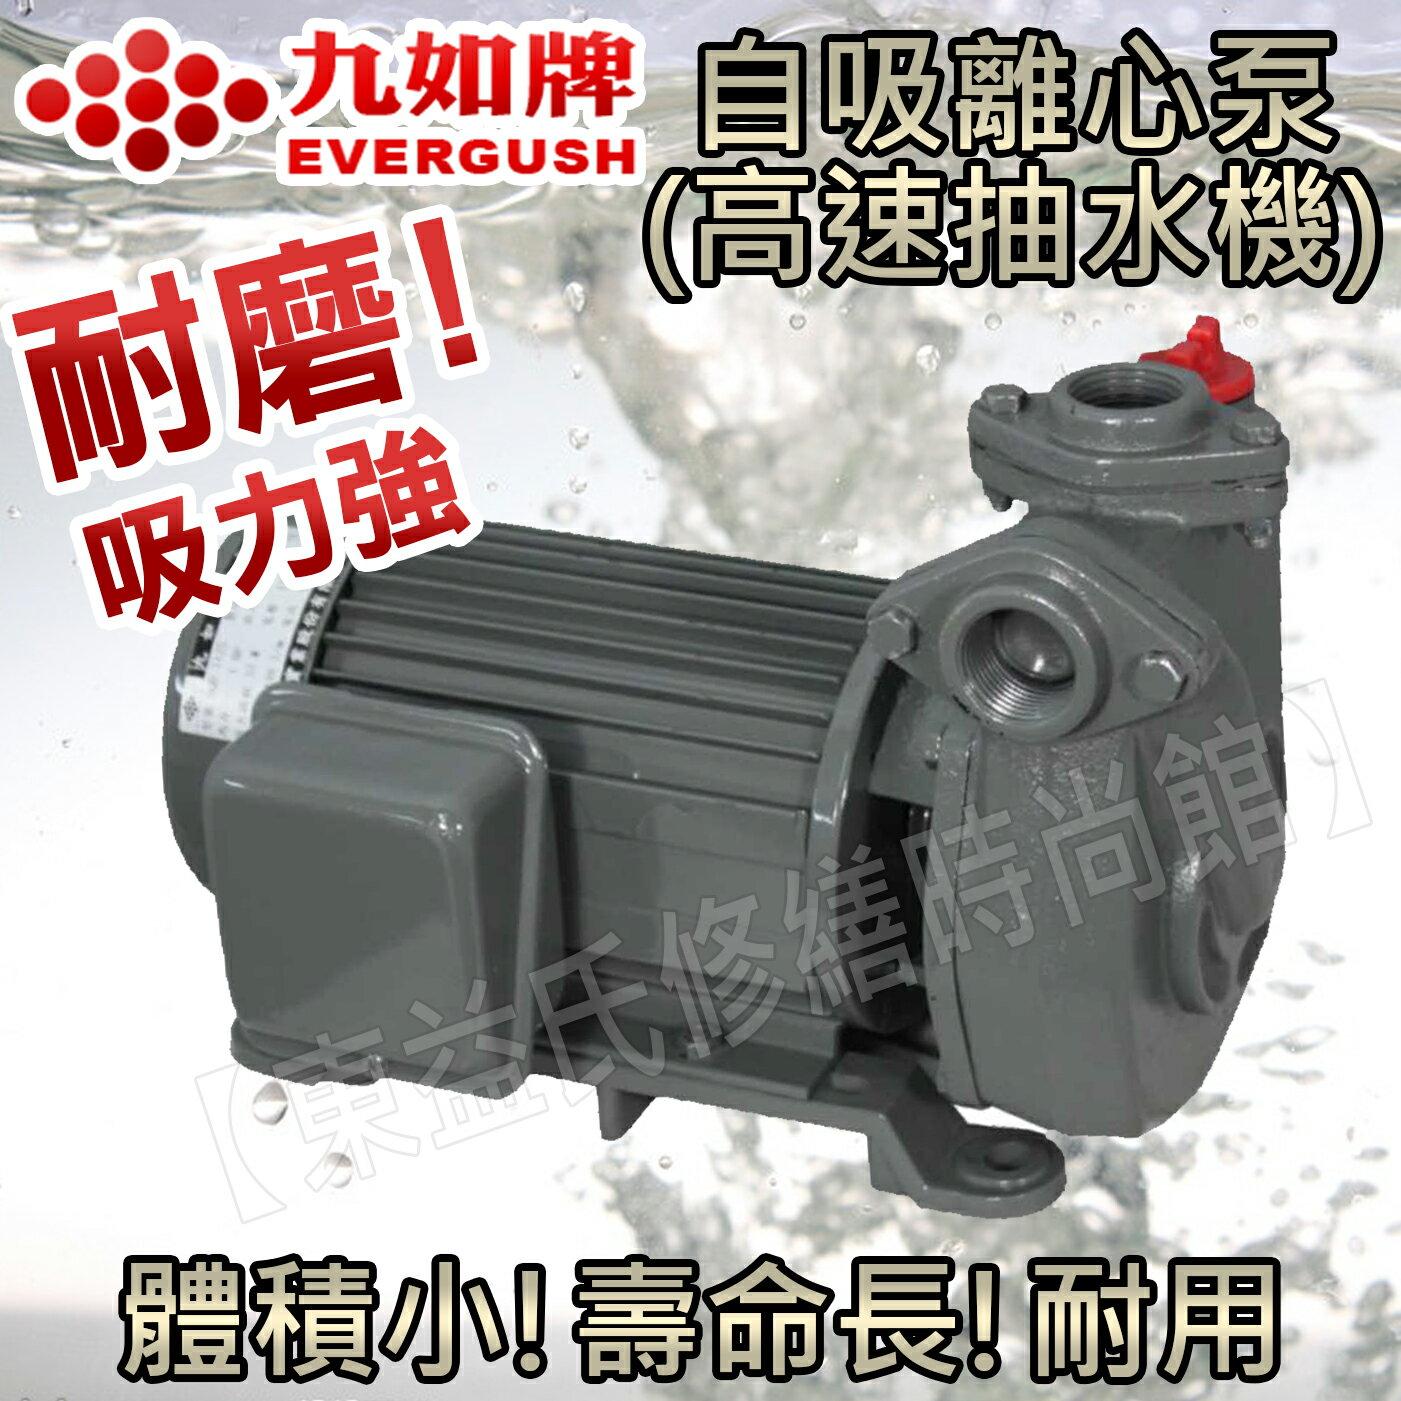 SQD-7140 九如牌1 HP 高速抽水馬達 110V/220V通用 體積小 壽命長 【東益氏】售 大井牌 抽水馬達